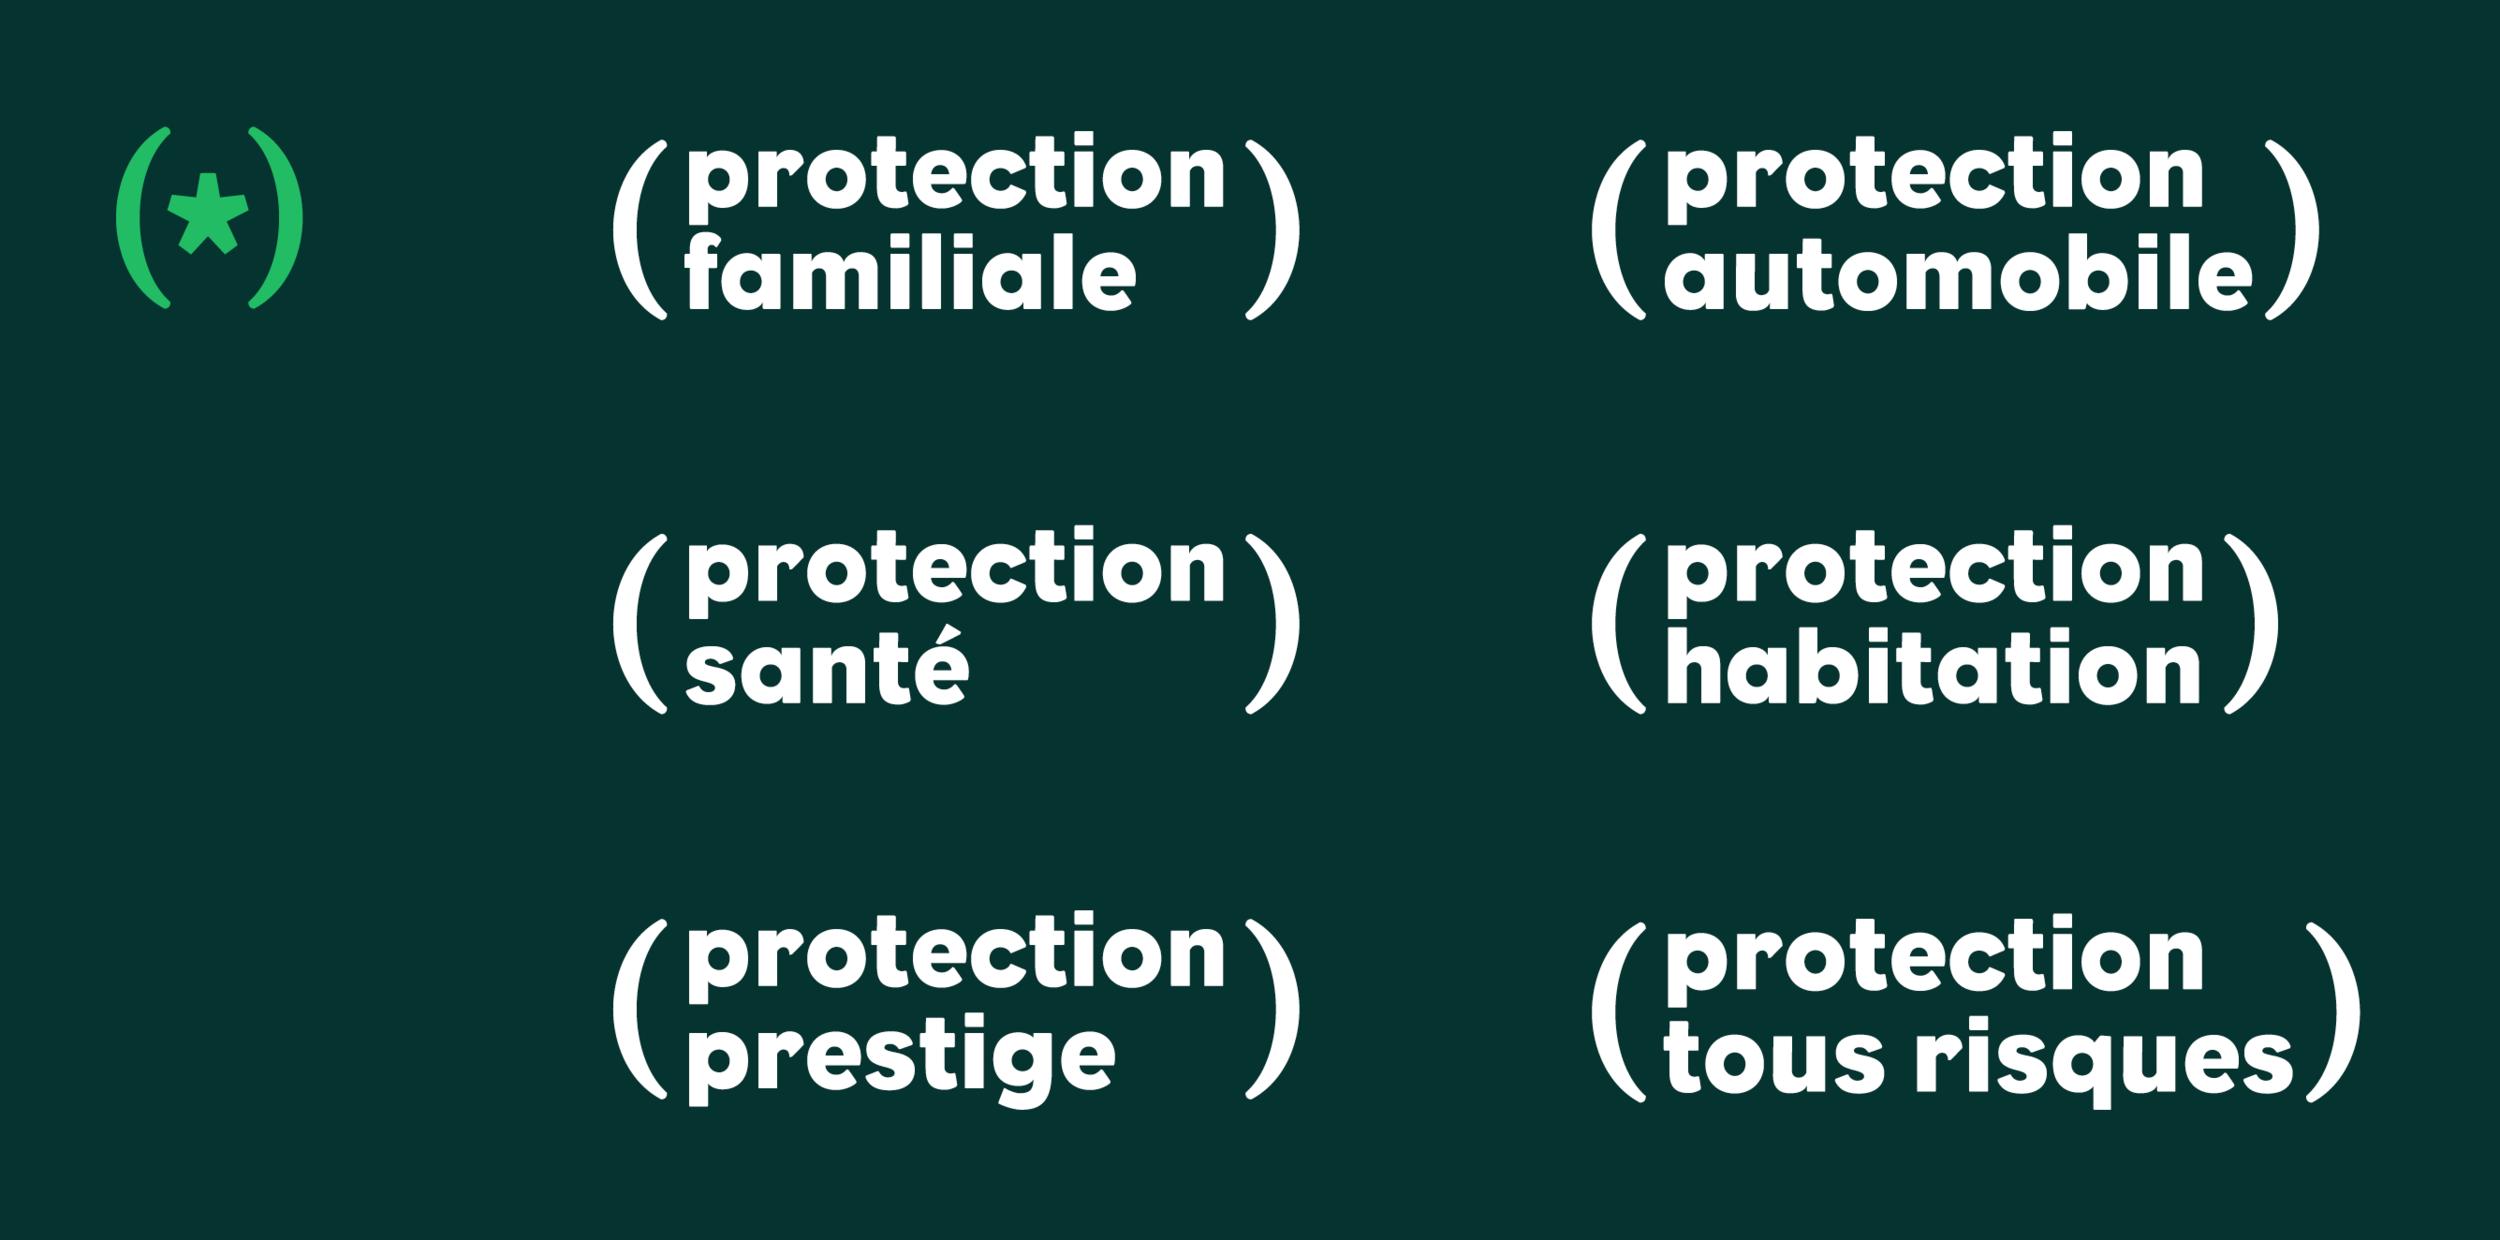 Vlevle-crab-insurance-baseline-logo-graphic_design-gaelle_de_laveleye